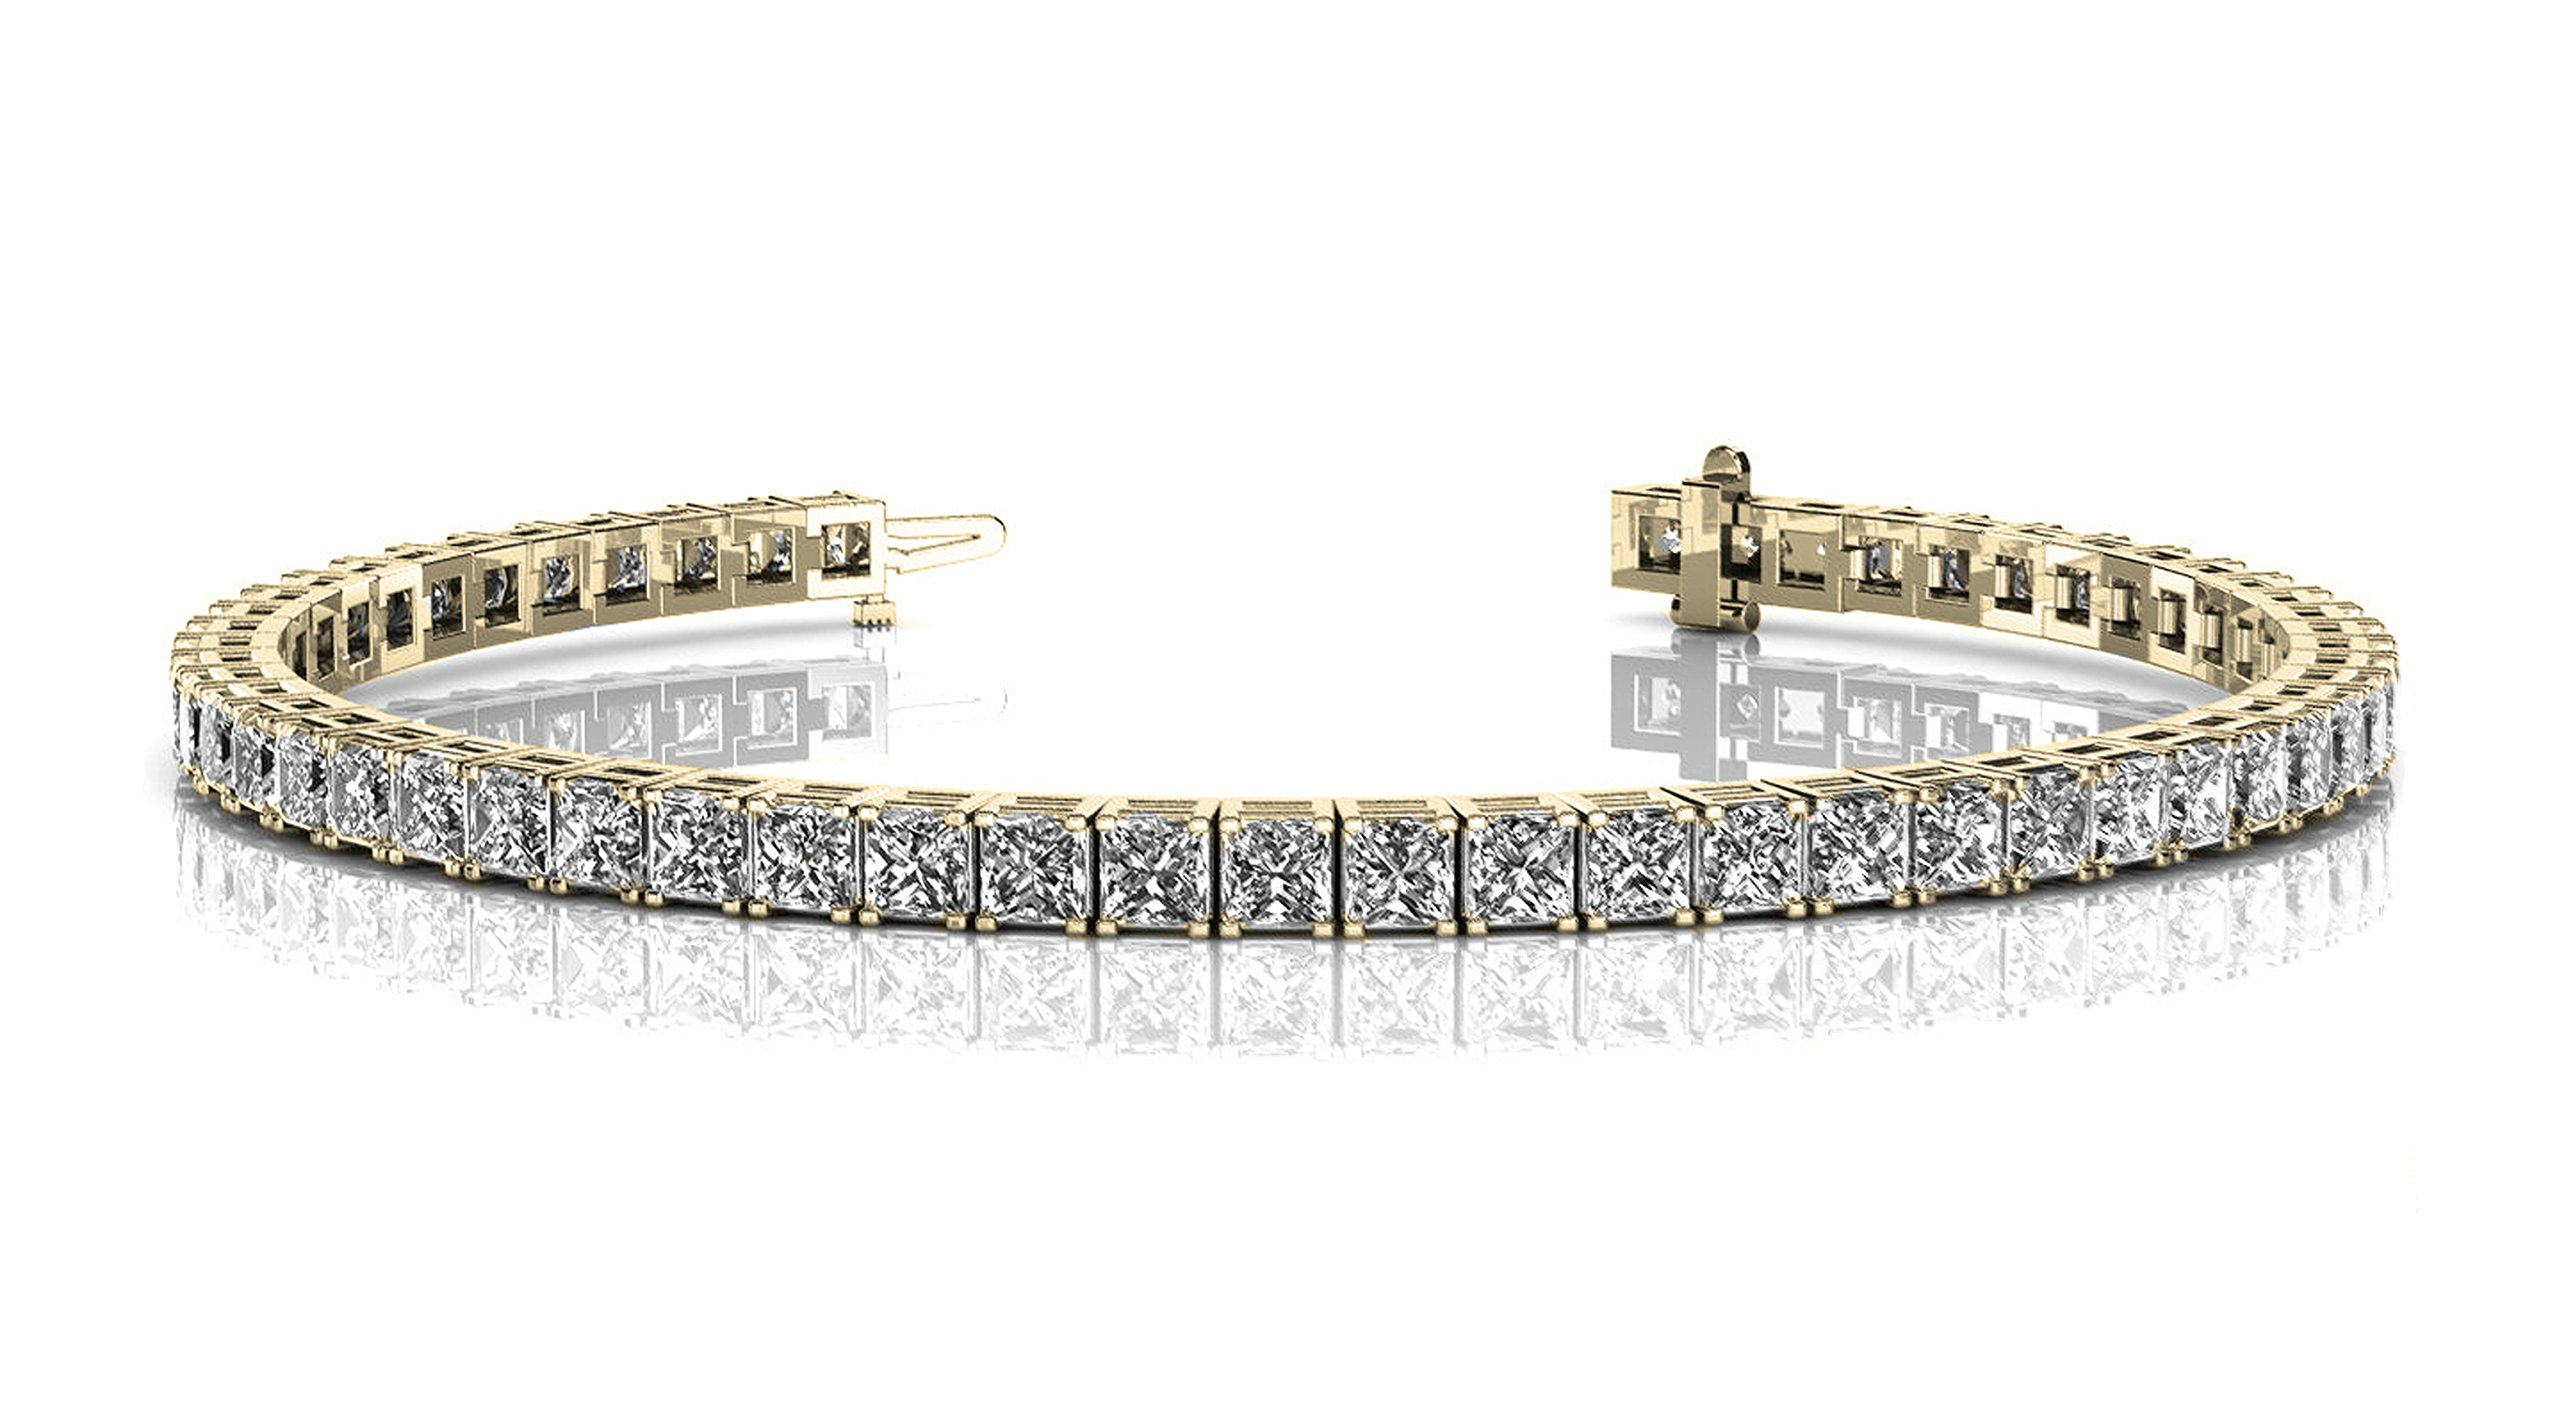 Cate & Chloe Leila 18k Tennis Bracelet, Women's 18k Yellow Gold Plated Tennis Bracelet w/Cubic Zirconia Square Crystals, 7.5'' Sparkling Stone Bracelet for Women, CZ Wrist Bracelets, MSRP - $170